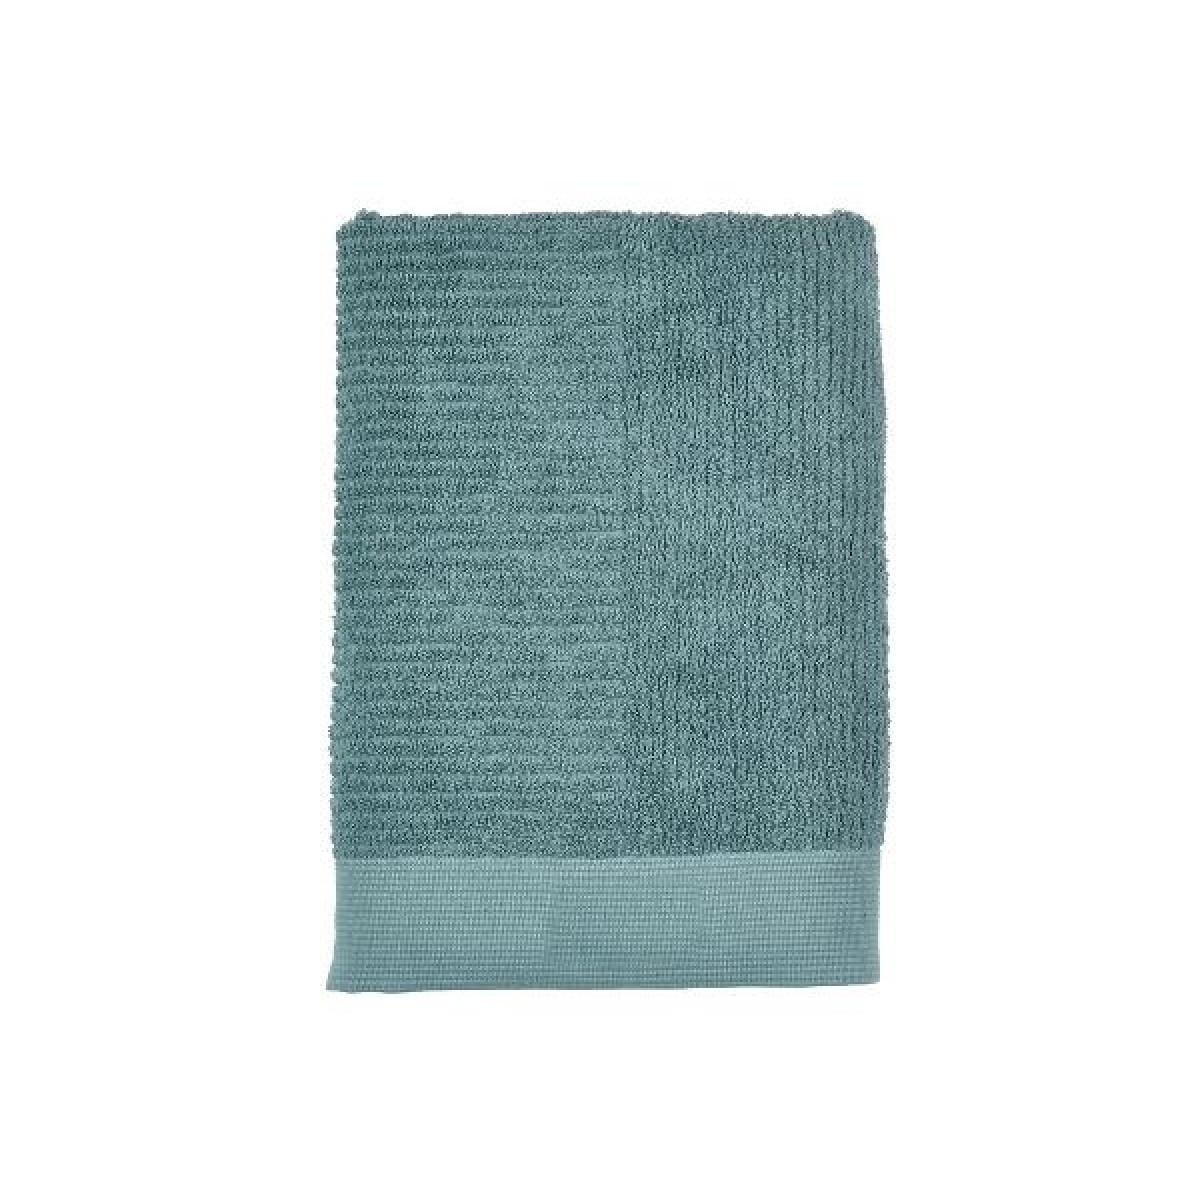 ZONE Classic håndkæde 140 x 70 cm petrol green